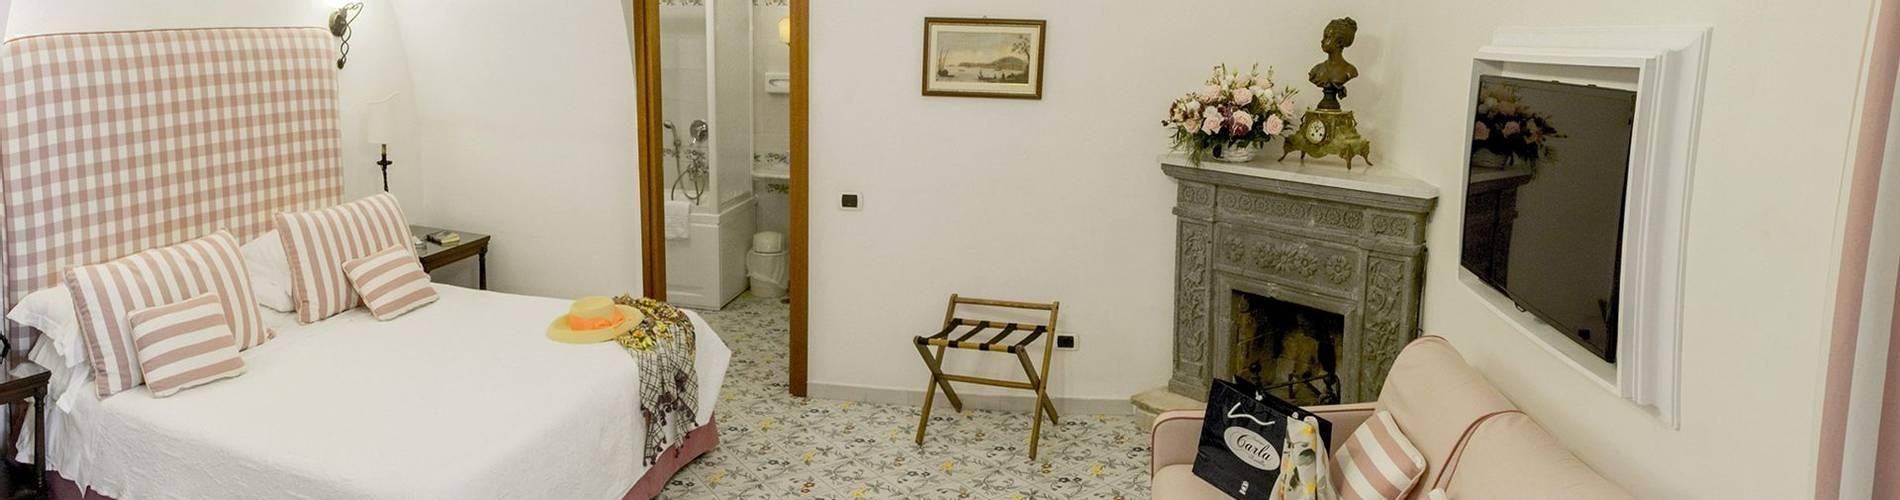 Villa Maria, Amalfi Coast, Italy, Superior r..jpg